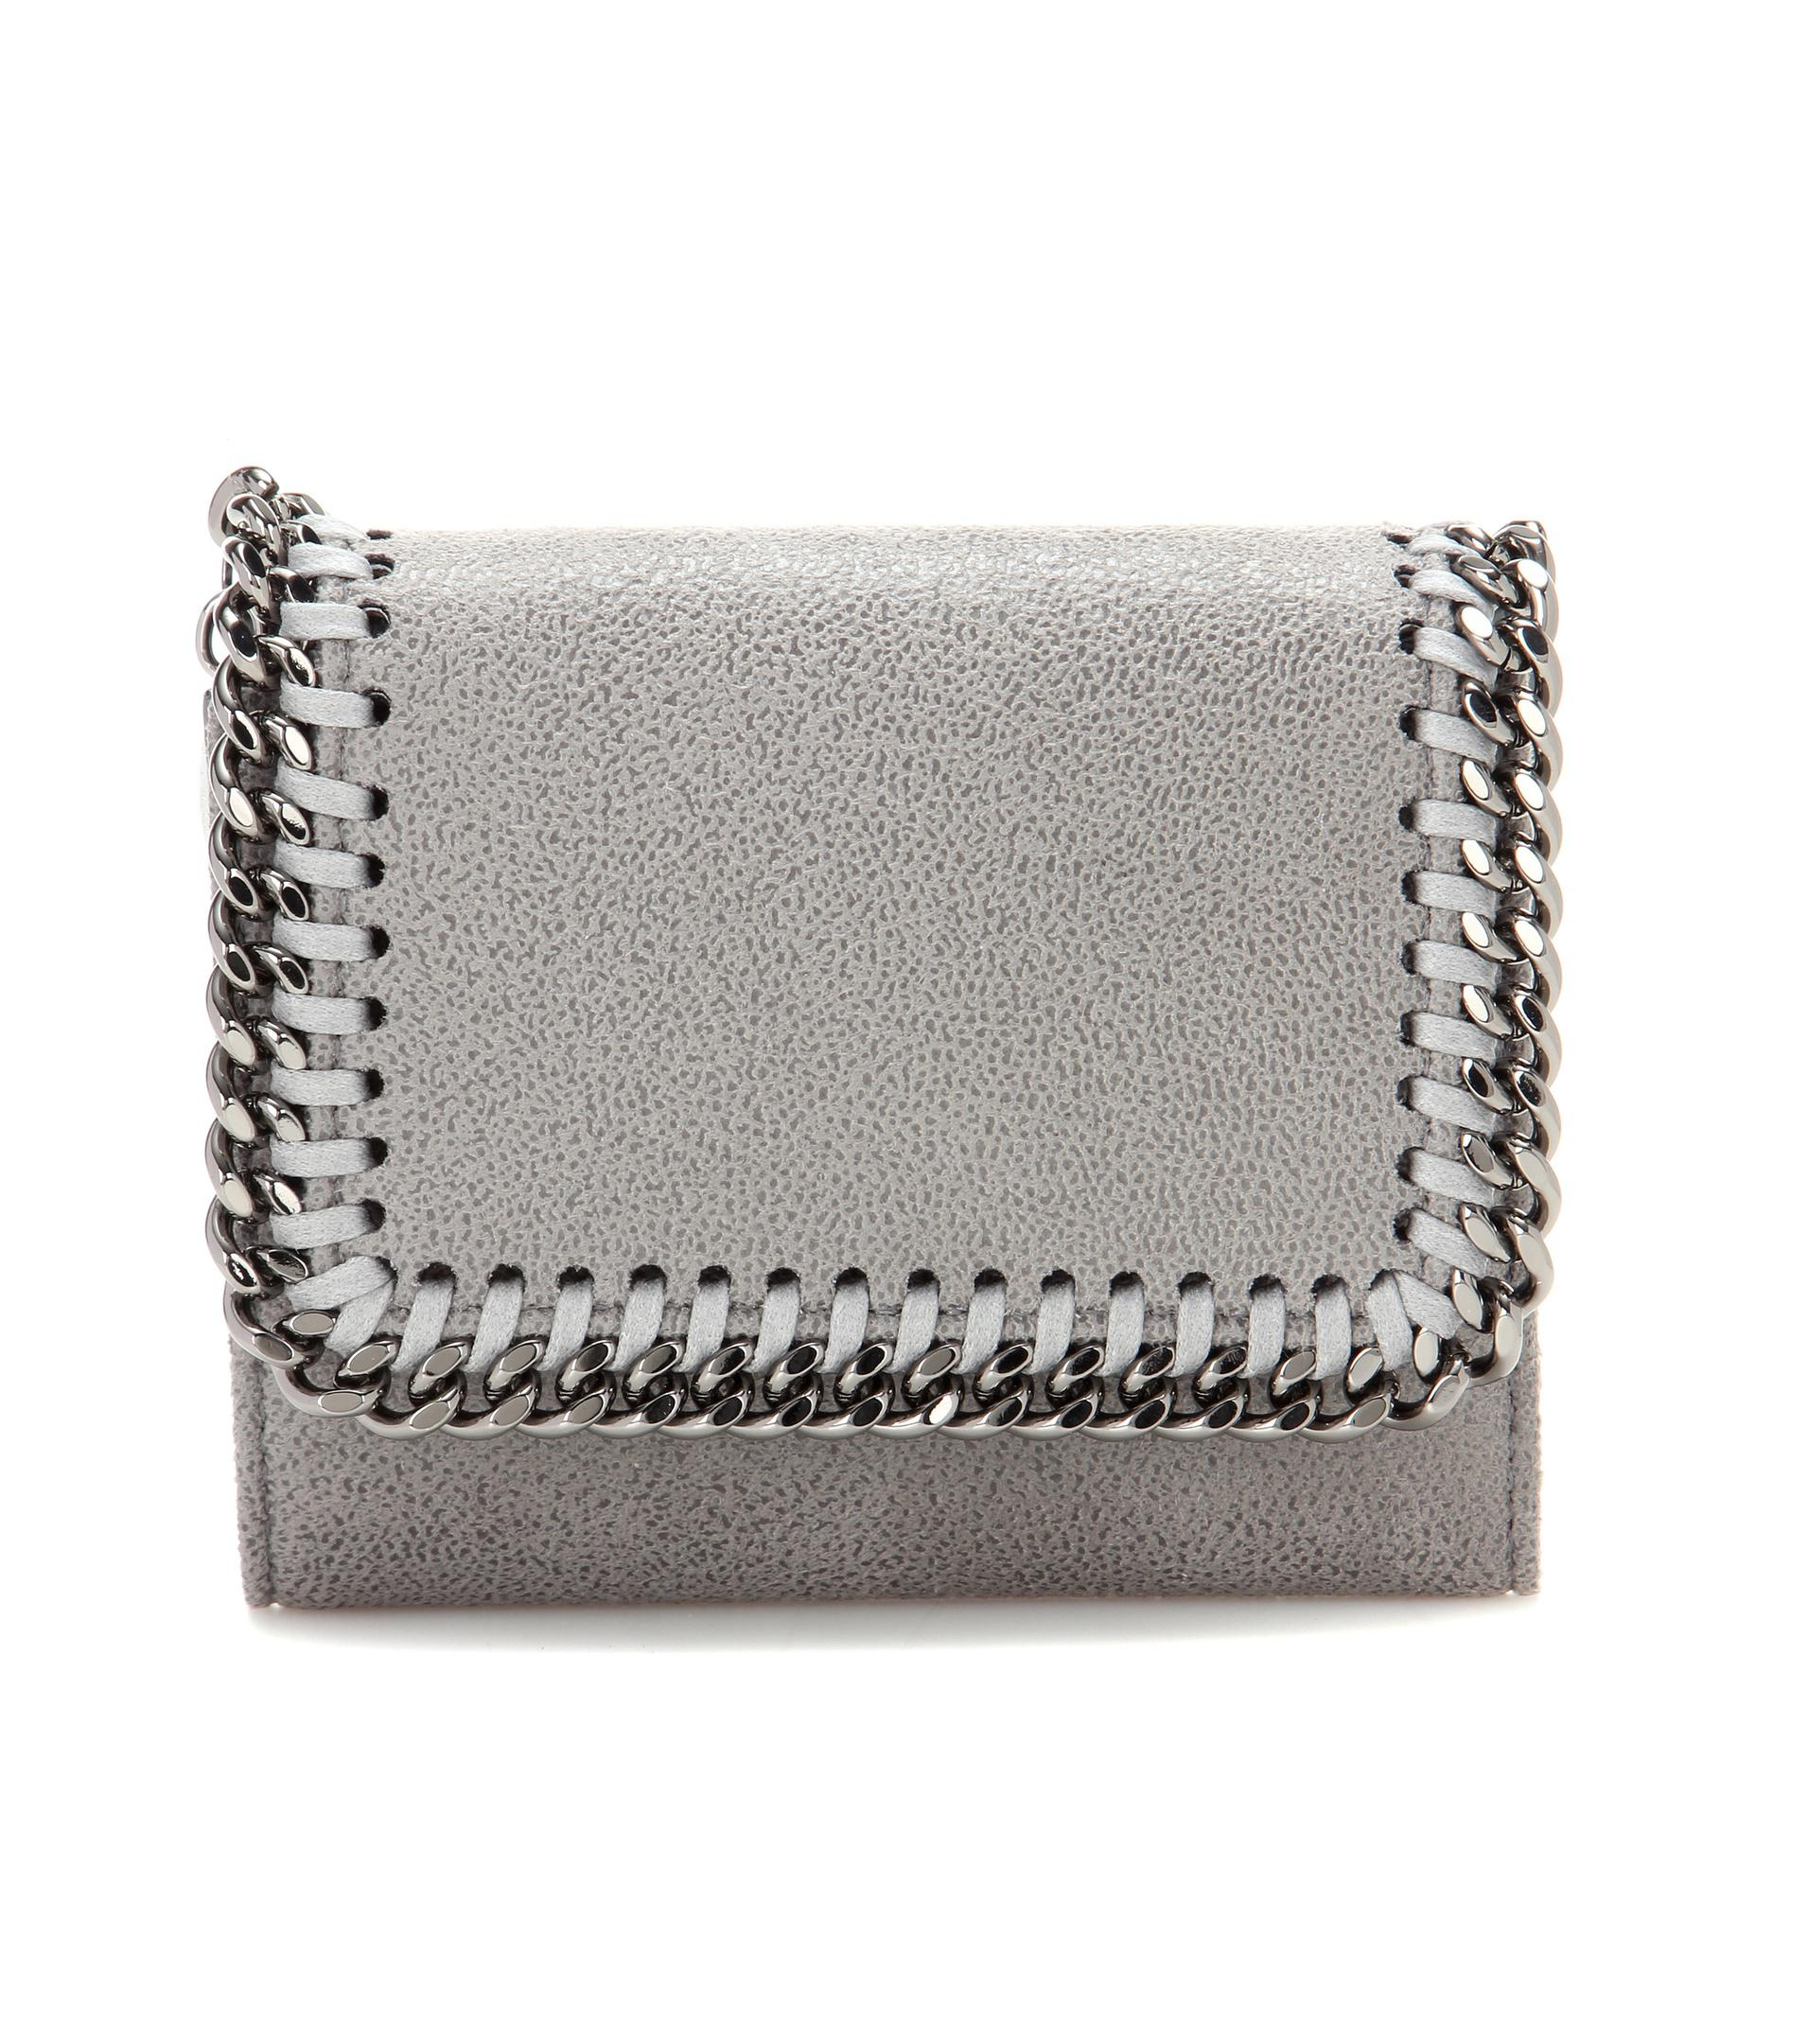 Best Store To Get For Sale Sale Fashionable mini Falabella flap wallet - Grey Stella McCartney Sale Big Sale pK1IRhN2m